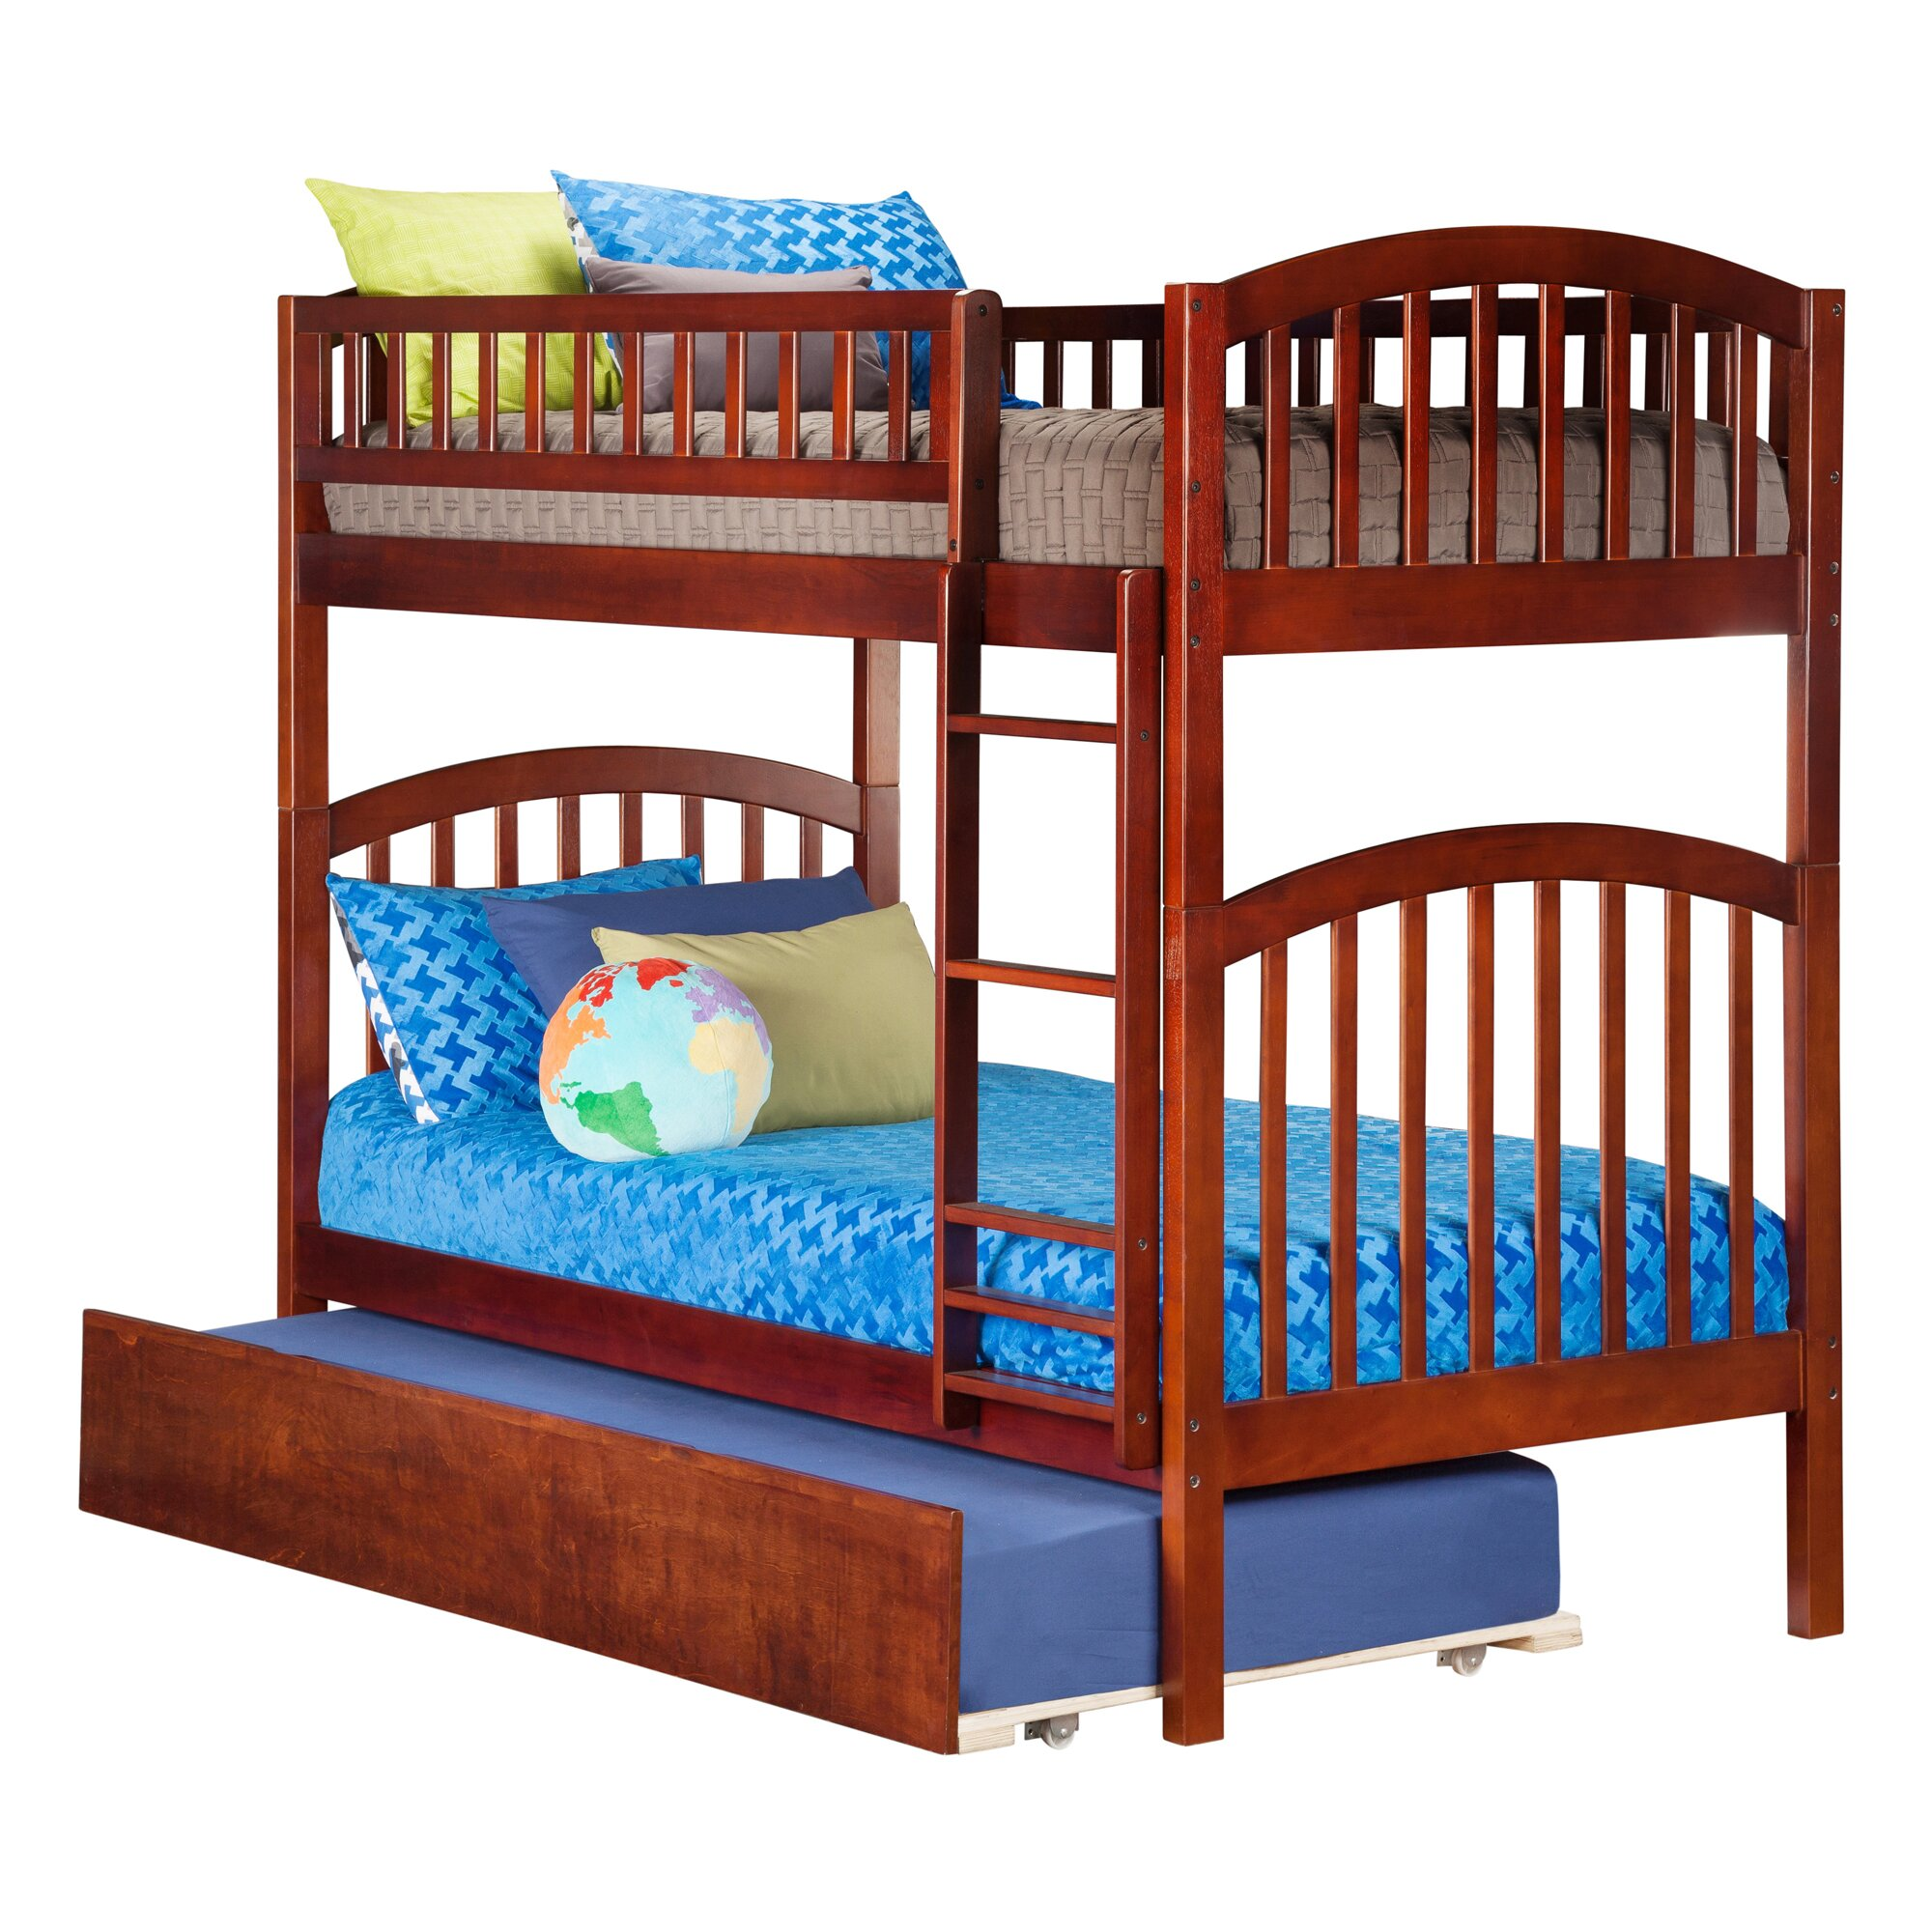 Atlantic Furniture Richland Twin Bunk Bed Reviews Wayfair